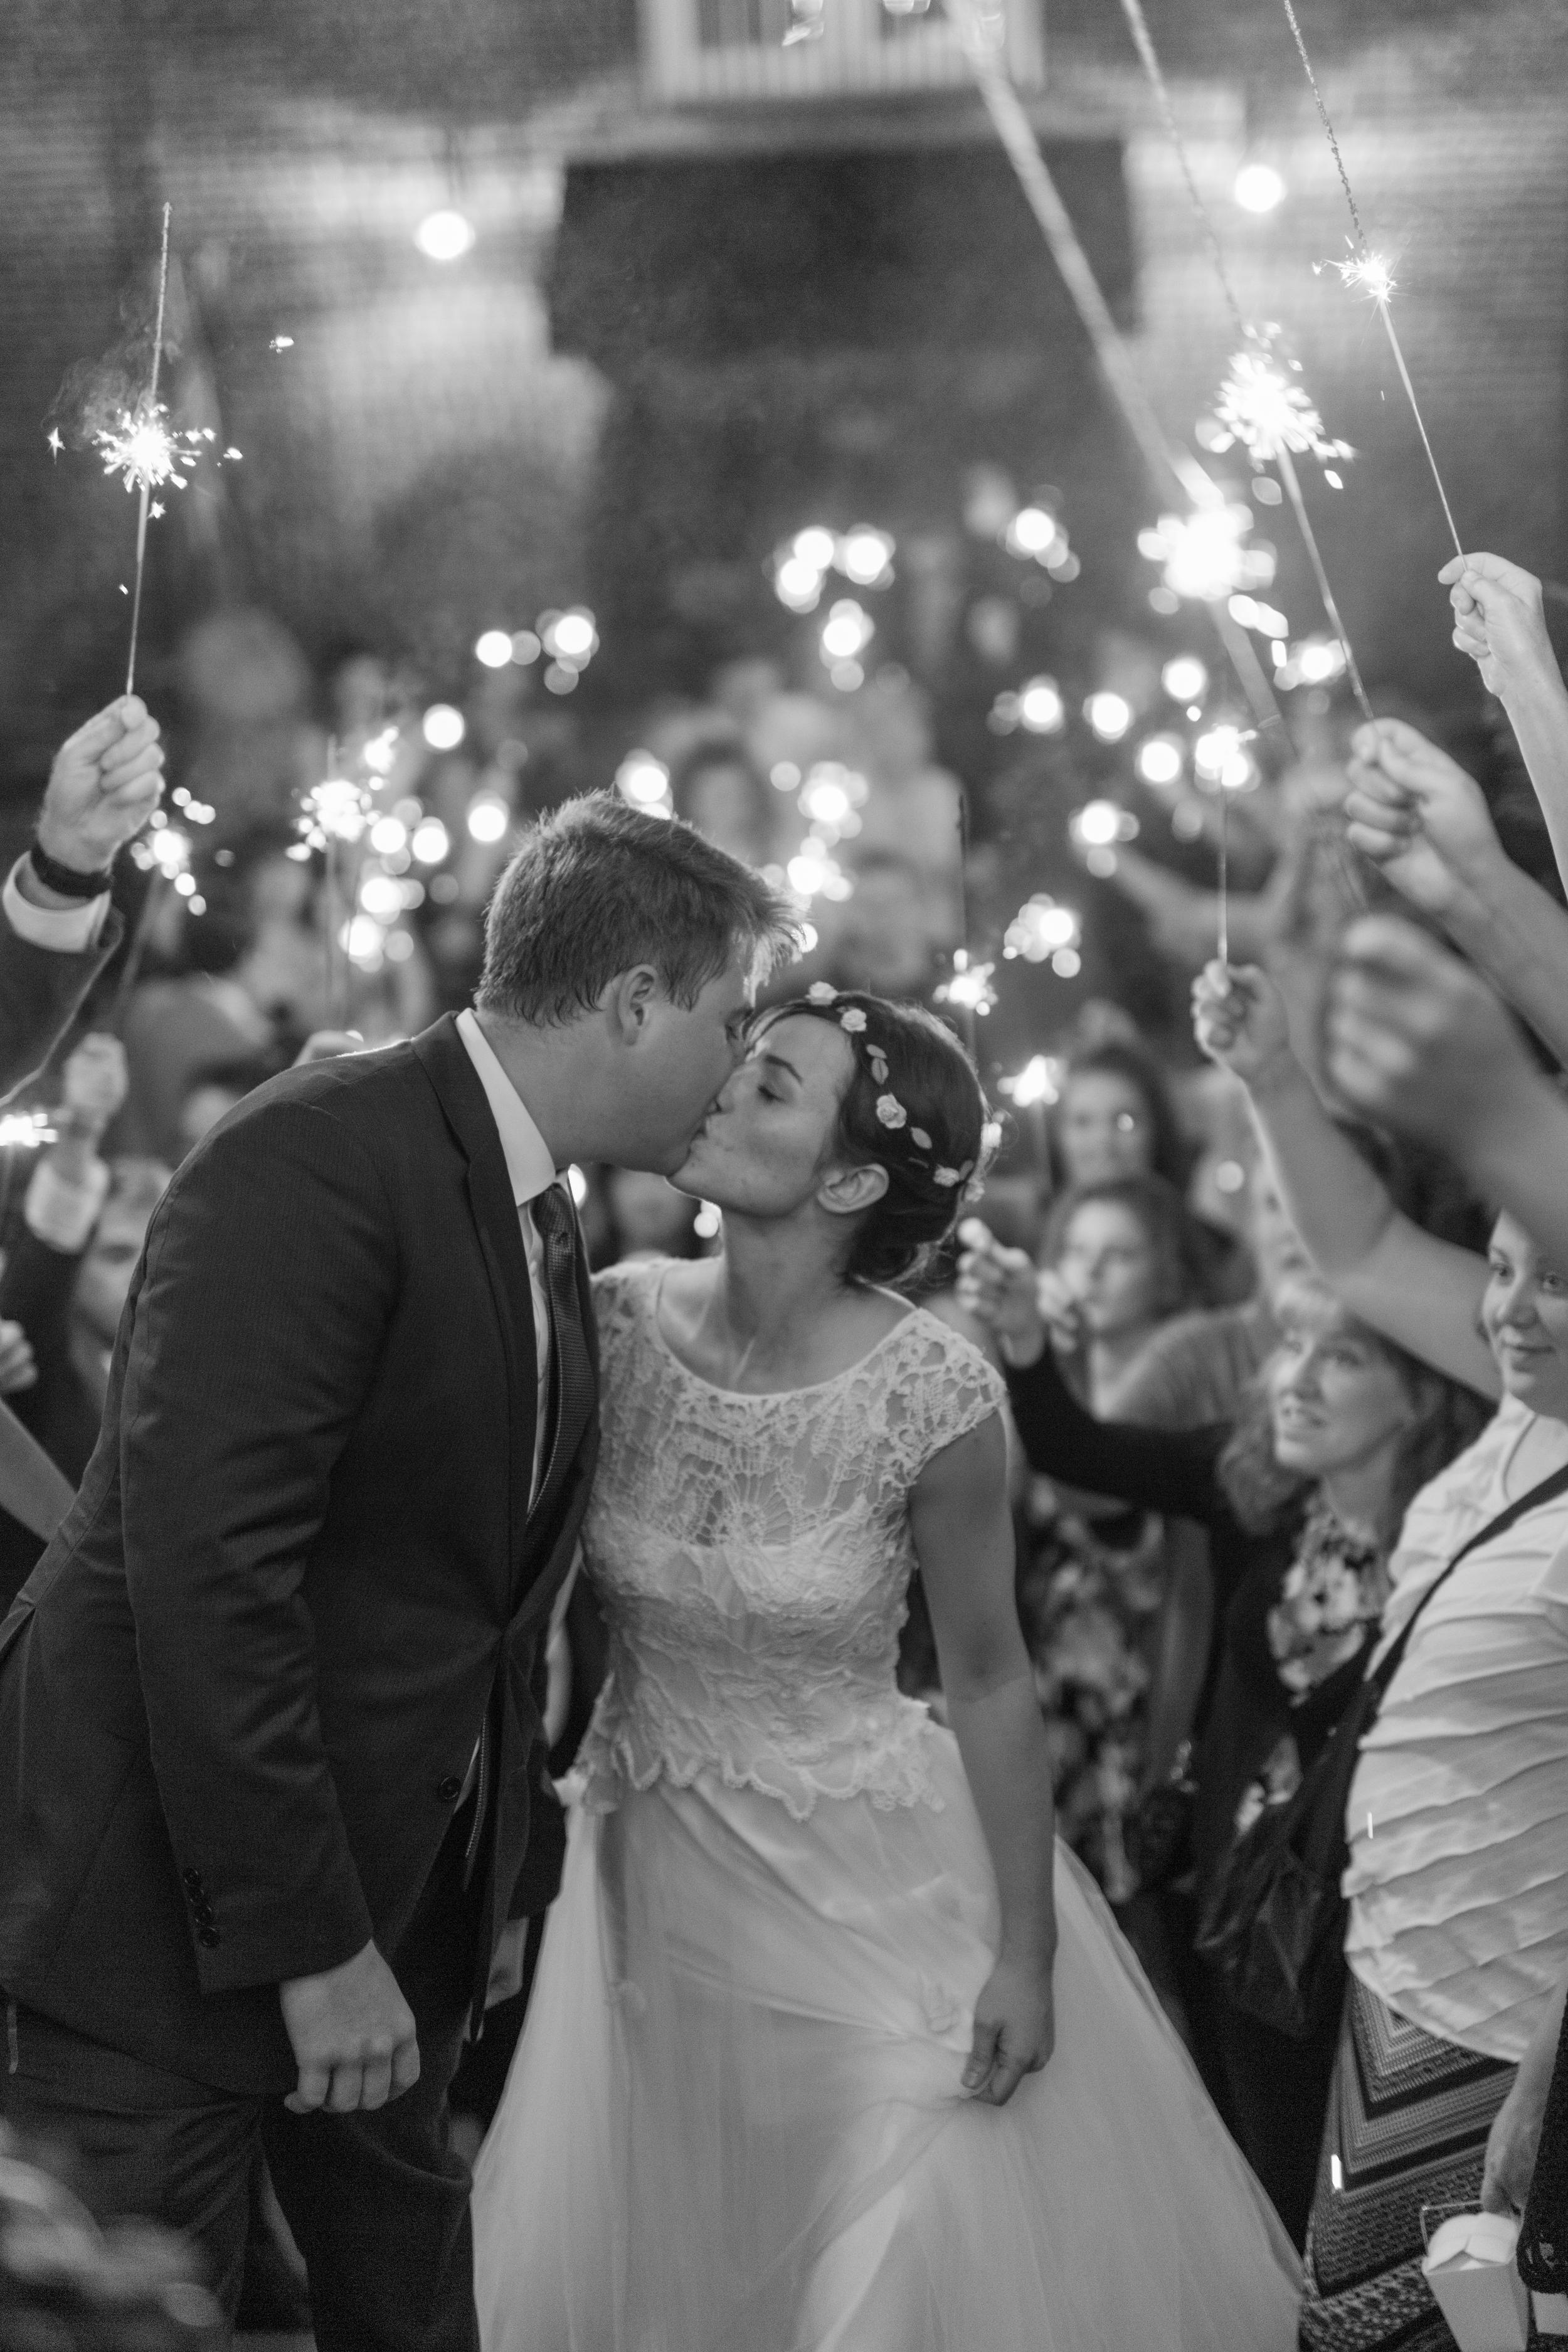 Lynchburg Wedding Photographer || Charlottesville Wedding Photographer || Ashley Eiban Photography || www.ashleyeiban.com